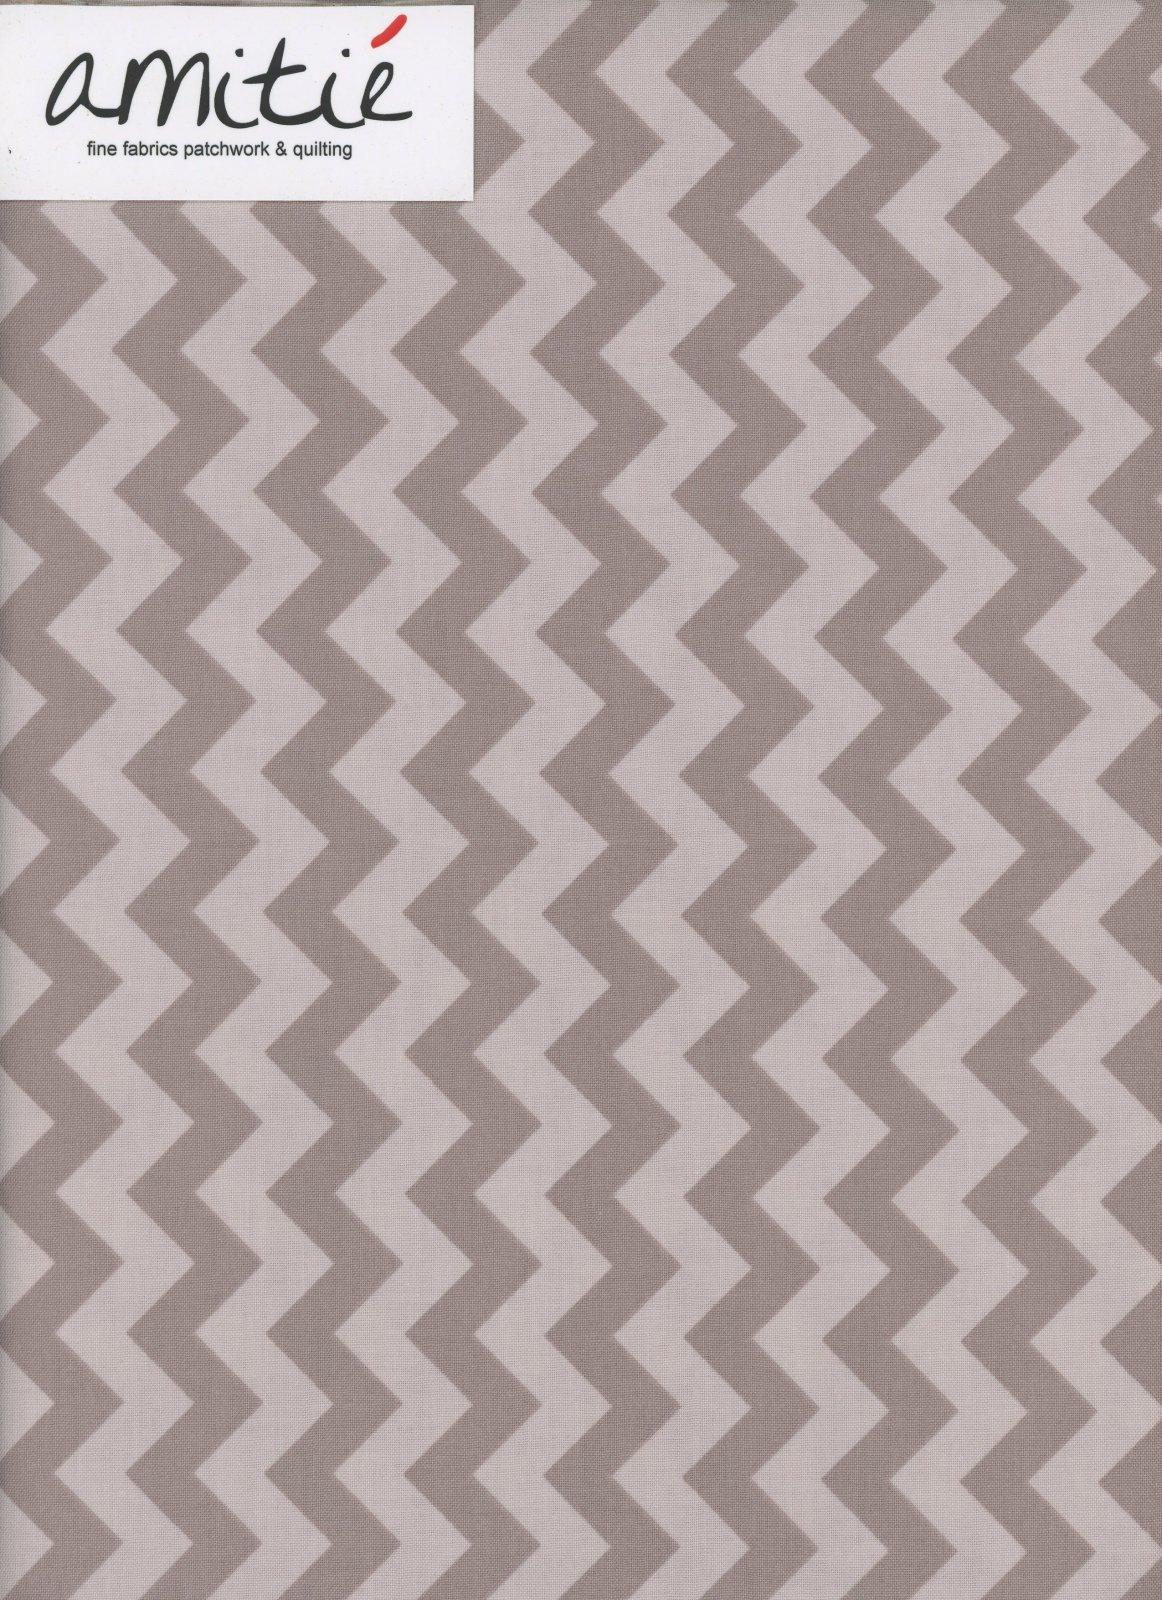 Small Chevron Tone on tone Gray